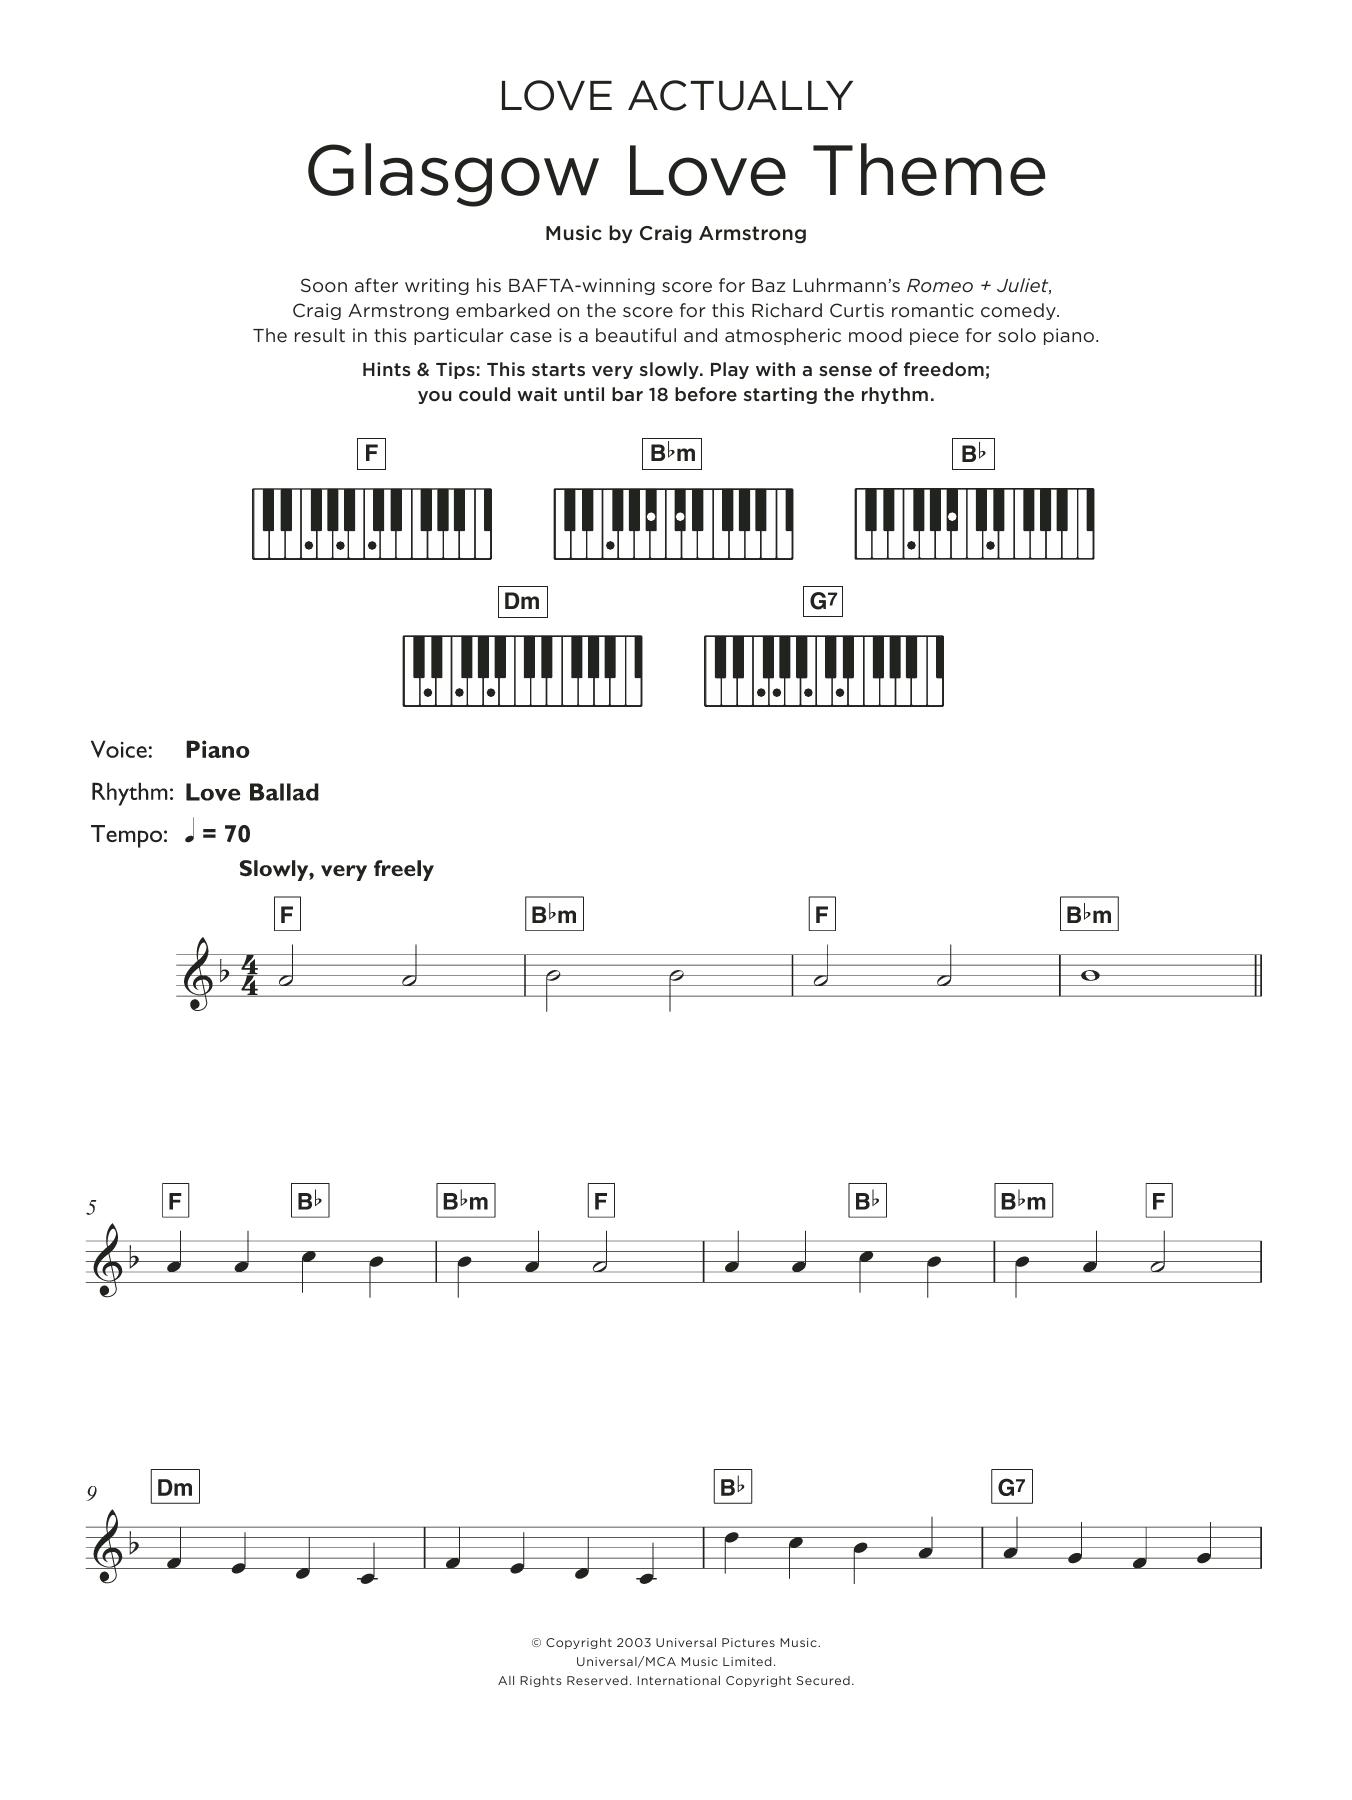 Glasgow Love Theme Sheet Music